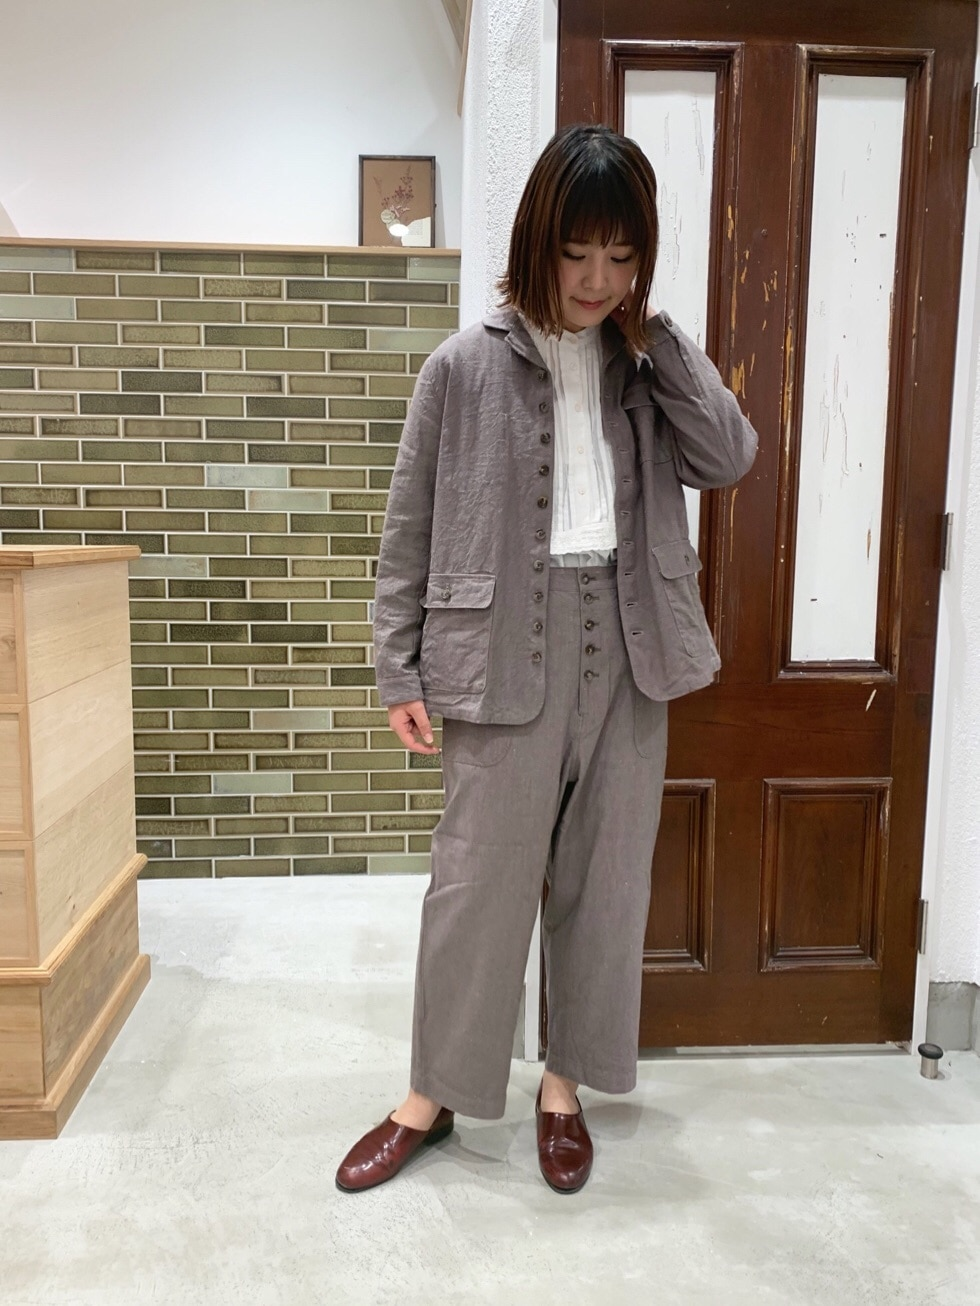 chambre de charme 横浜ジョイナス 身長:162cm 2020.02.25